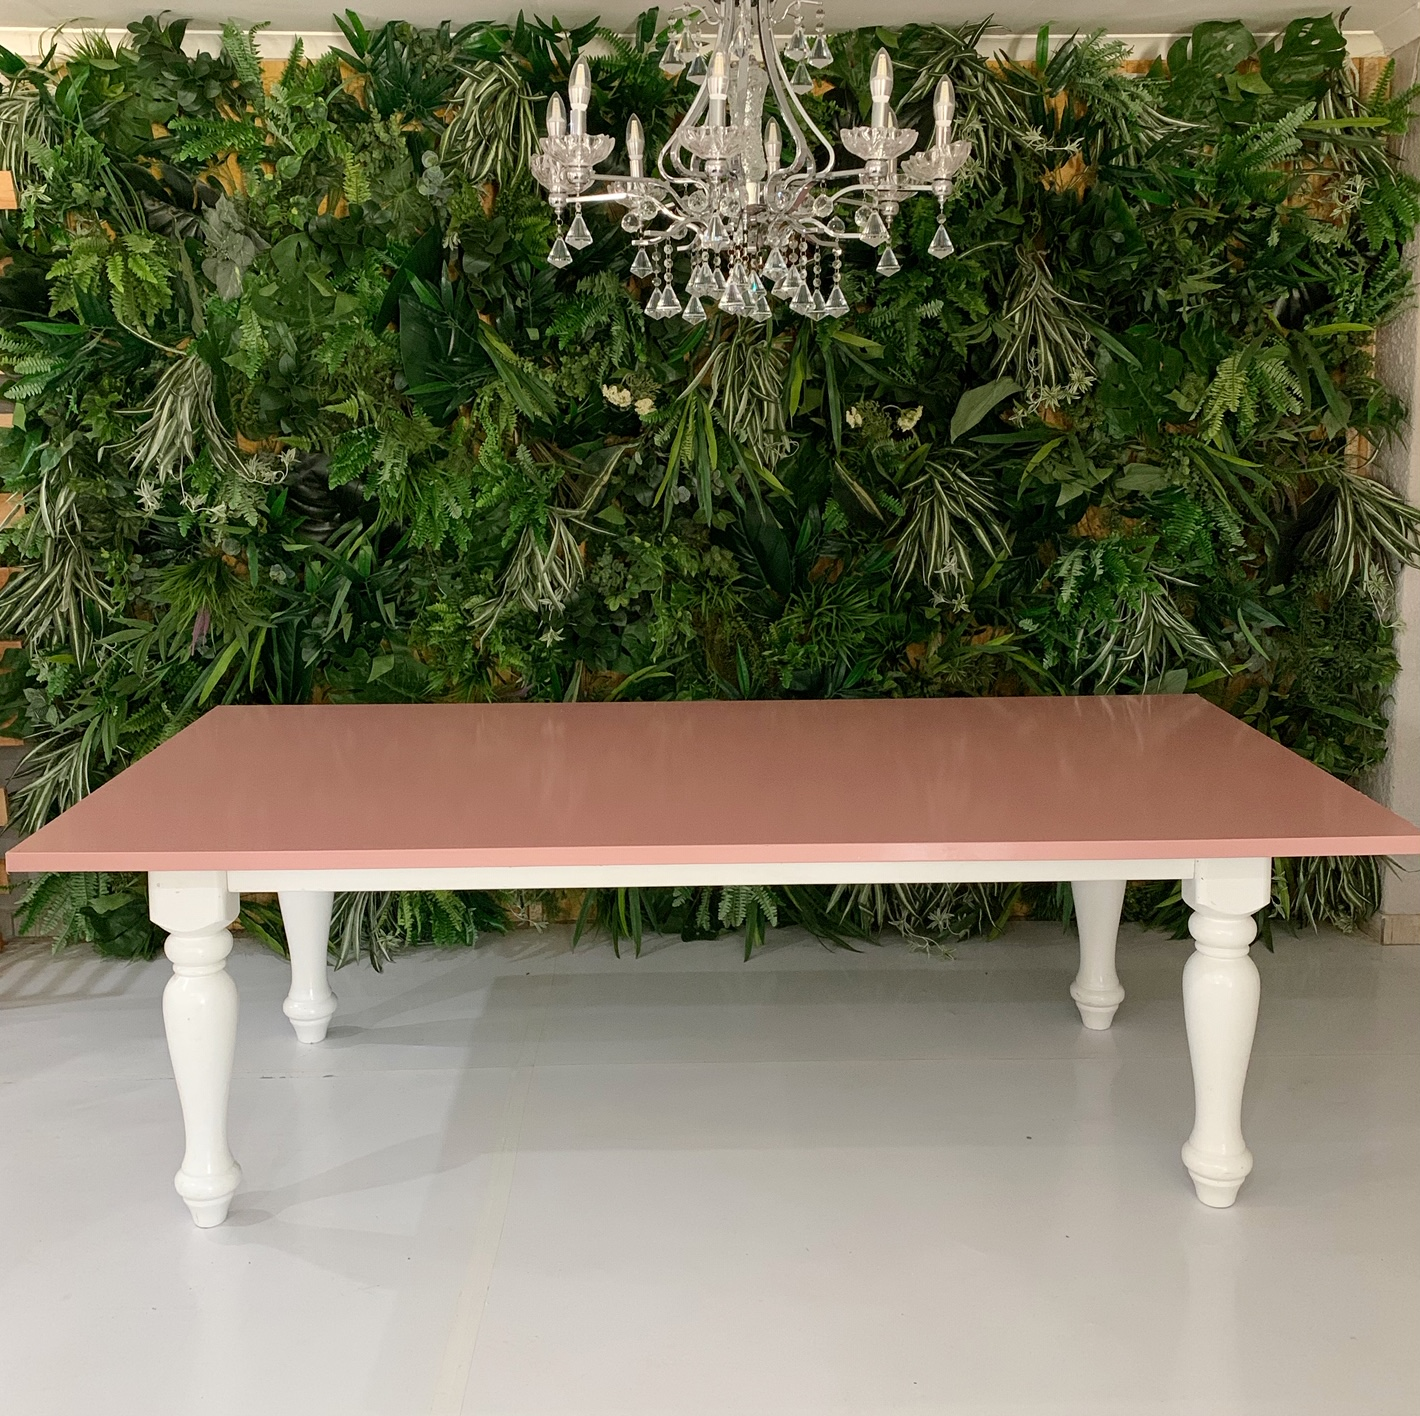 The Precious Table